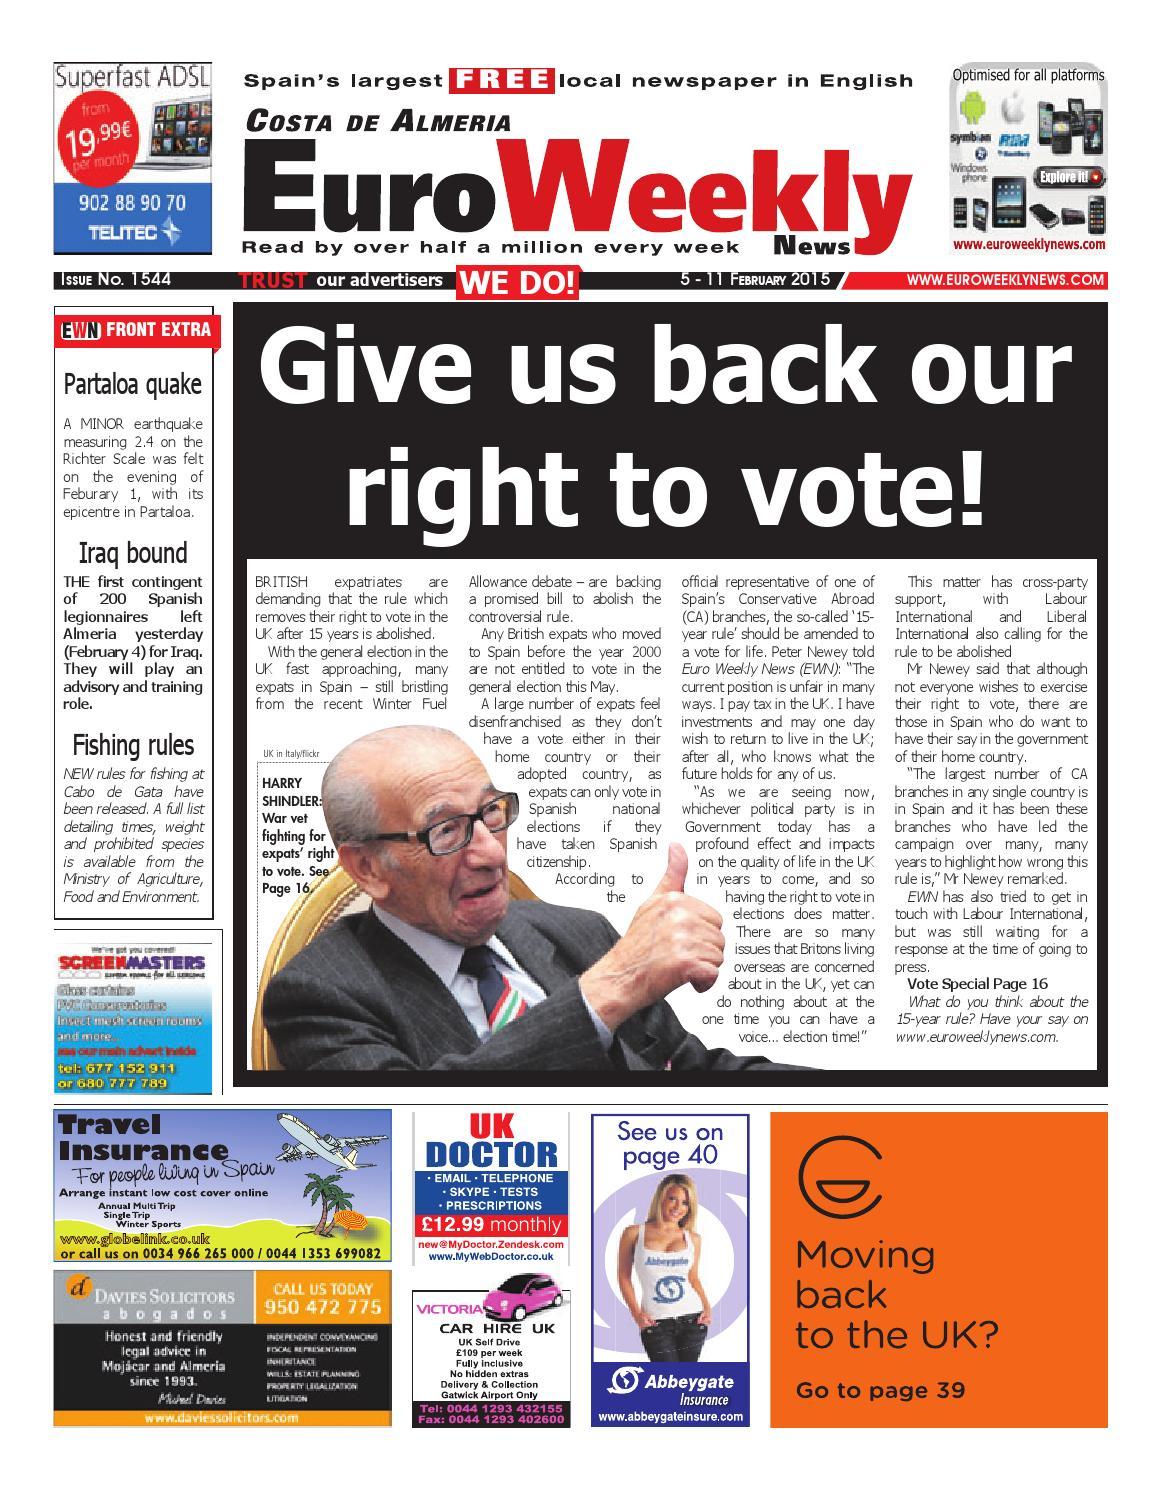 Euro Weekly News - Costa de Almeria 5 - 11 February 2015 Issue 1544 by Euro  Weekly News Media S.A. - issuu